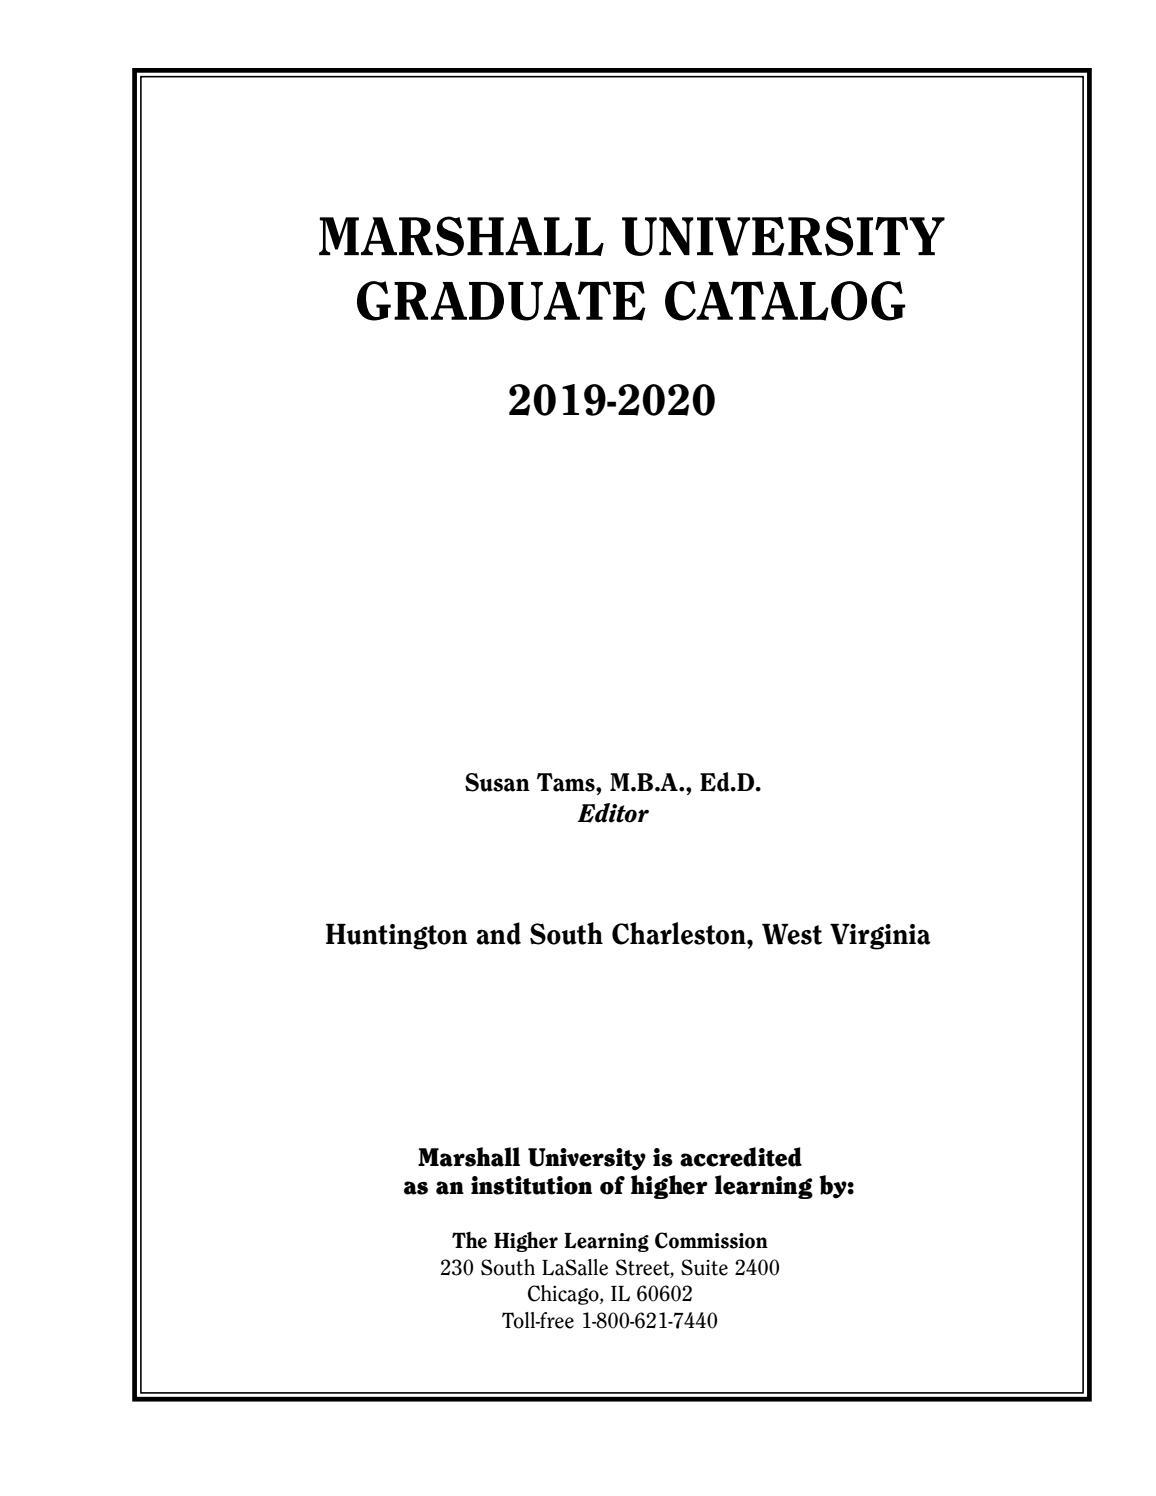 Marshall University Graduate Catalog, 2019-2020 by Susan